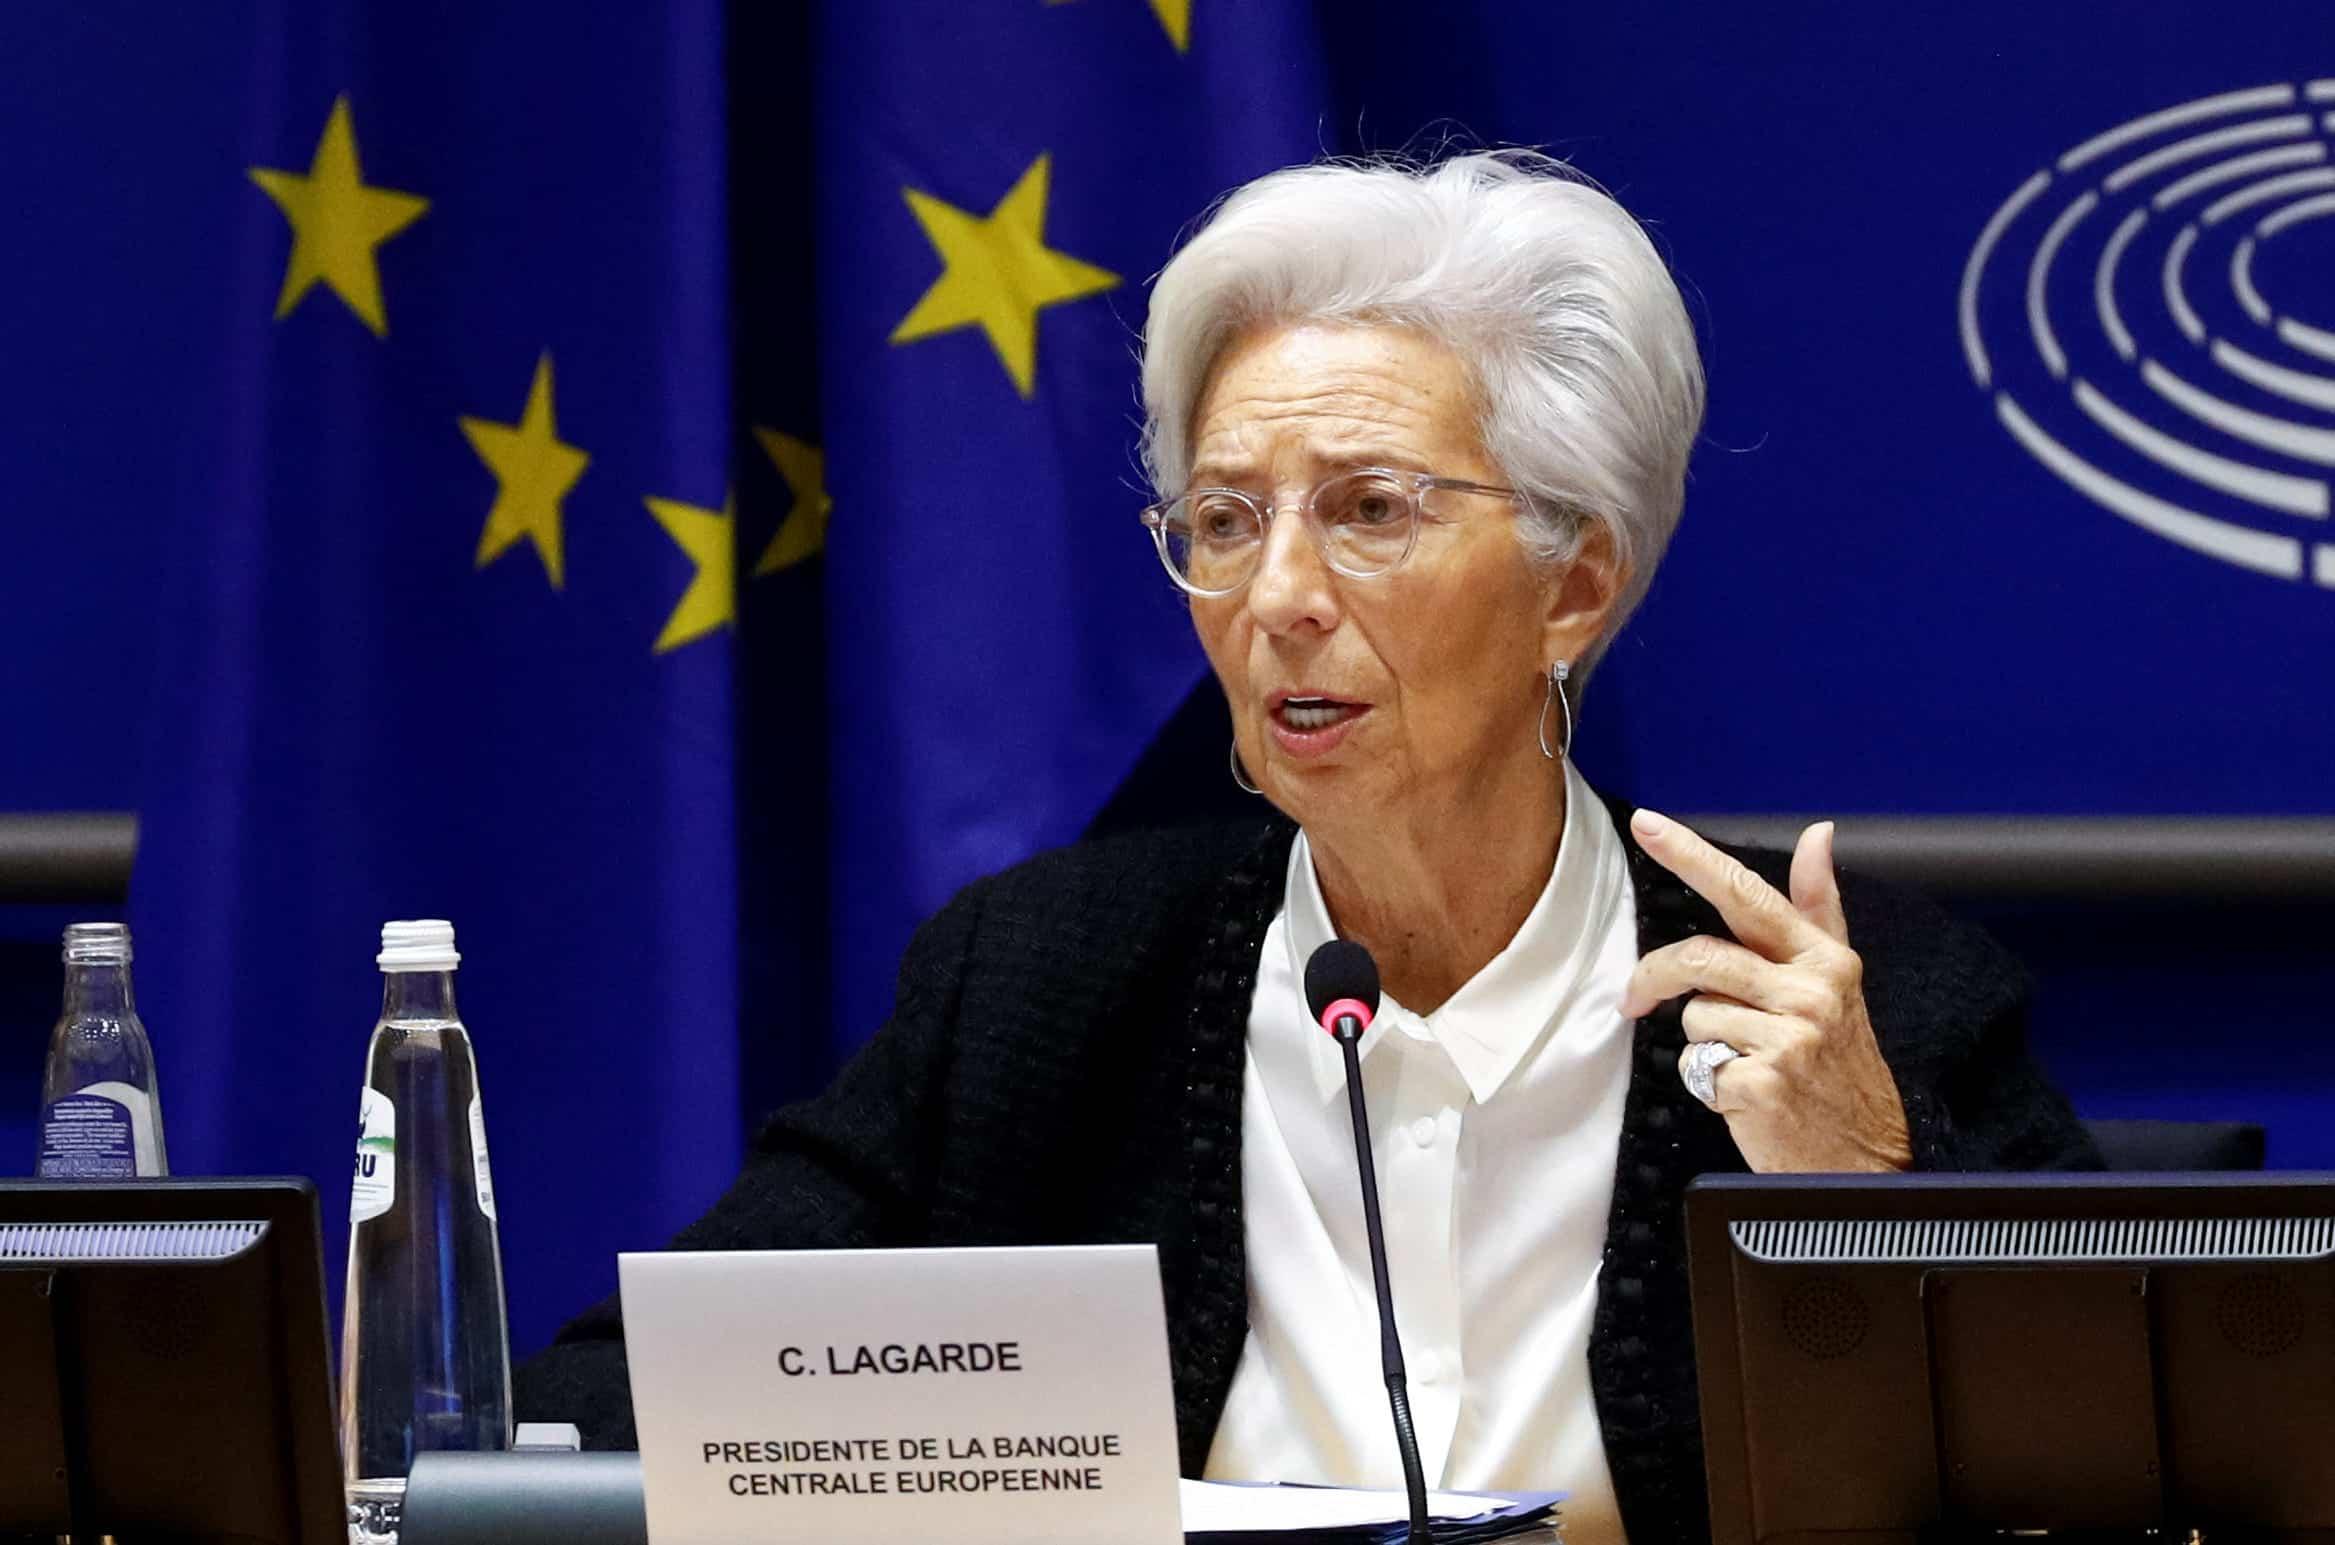 ECB President Christine Lagarde